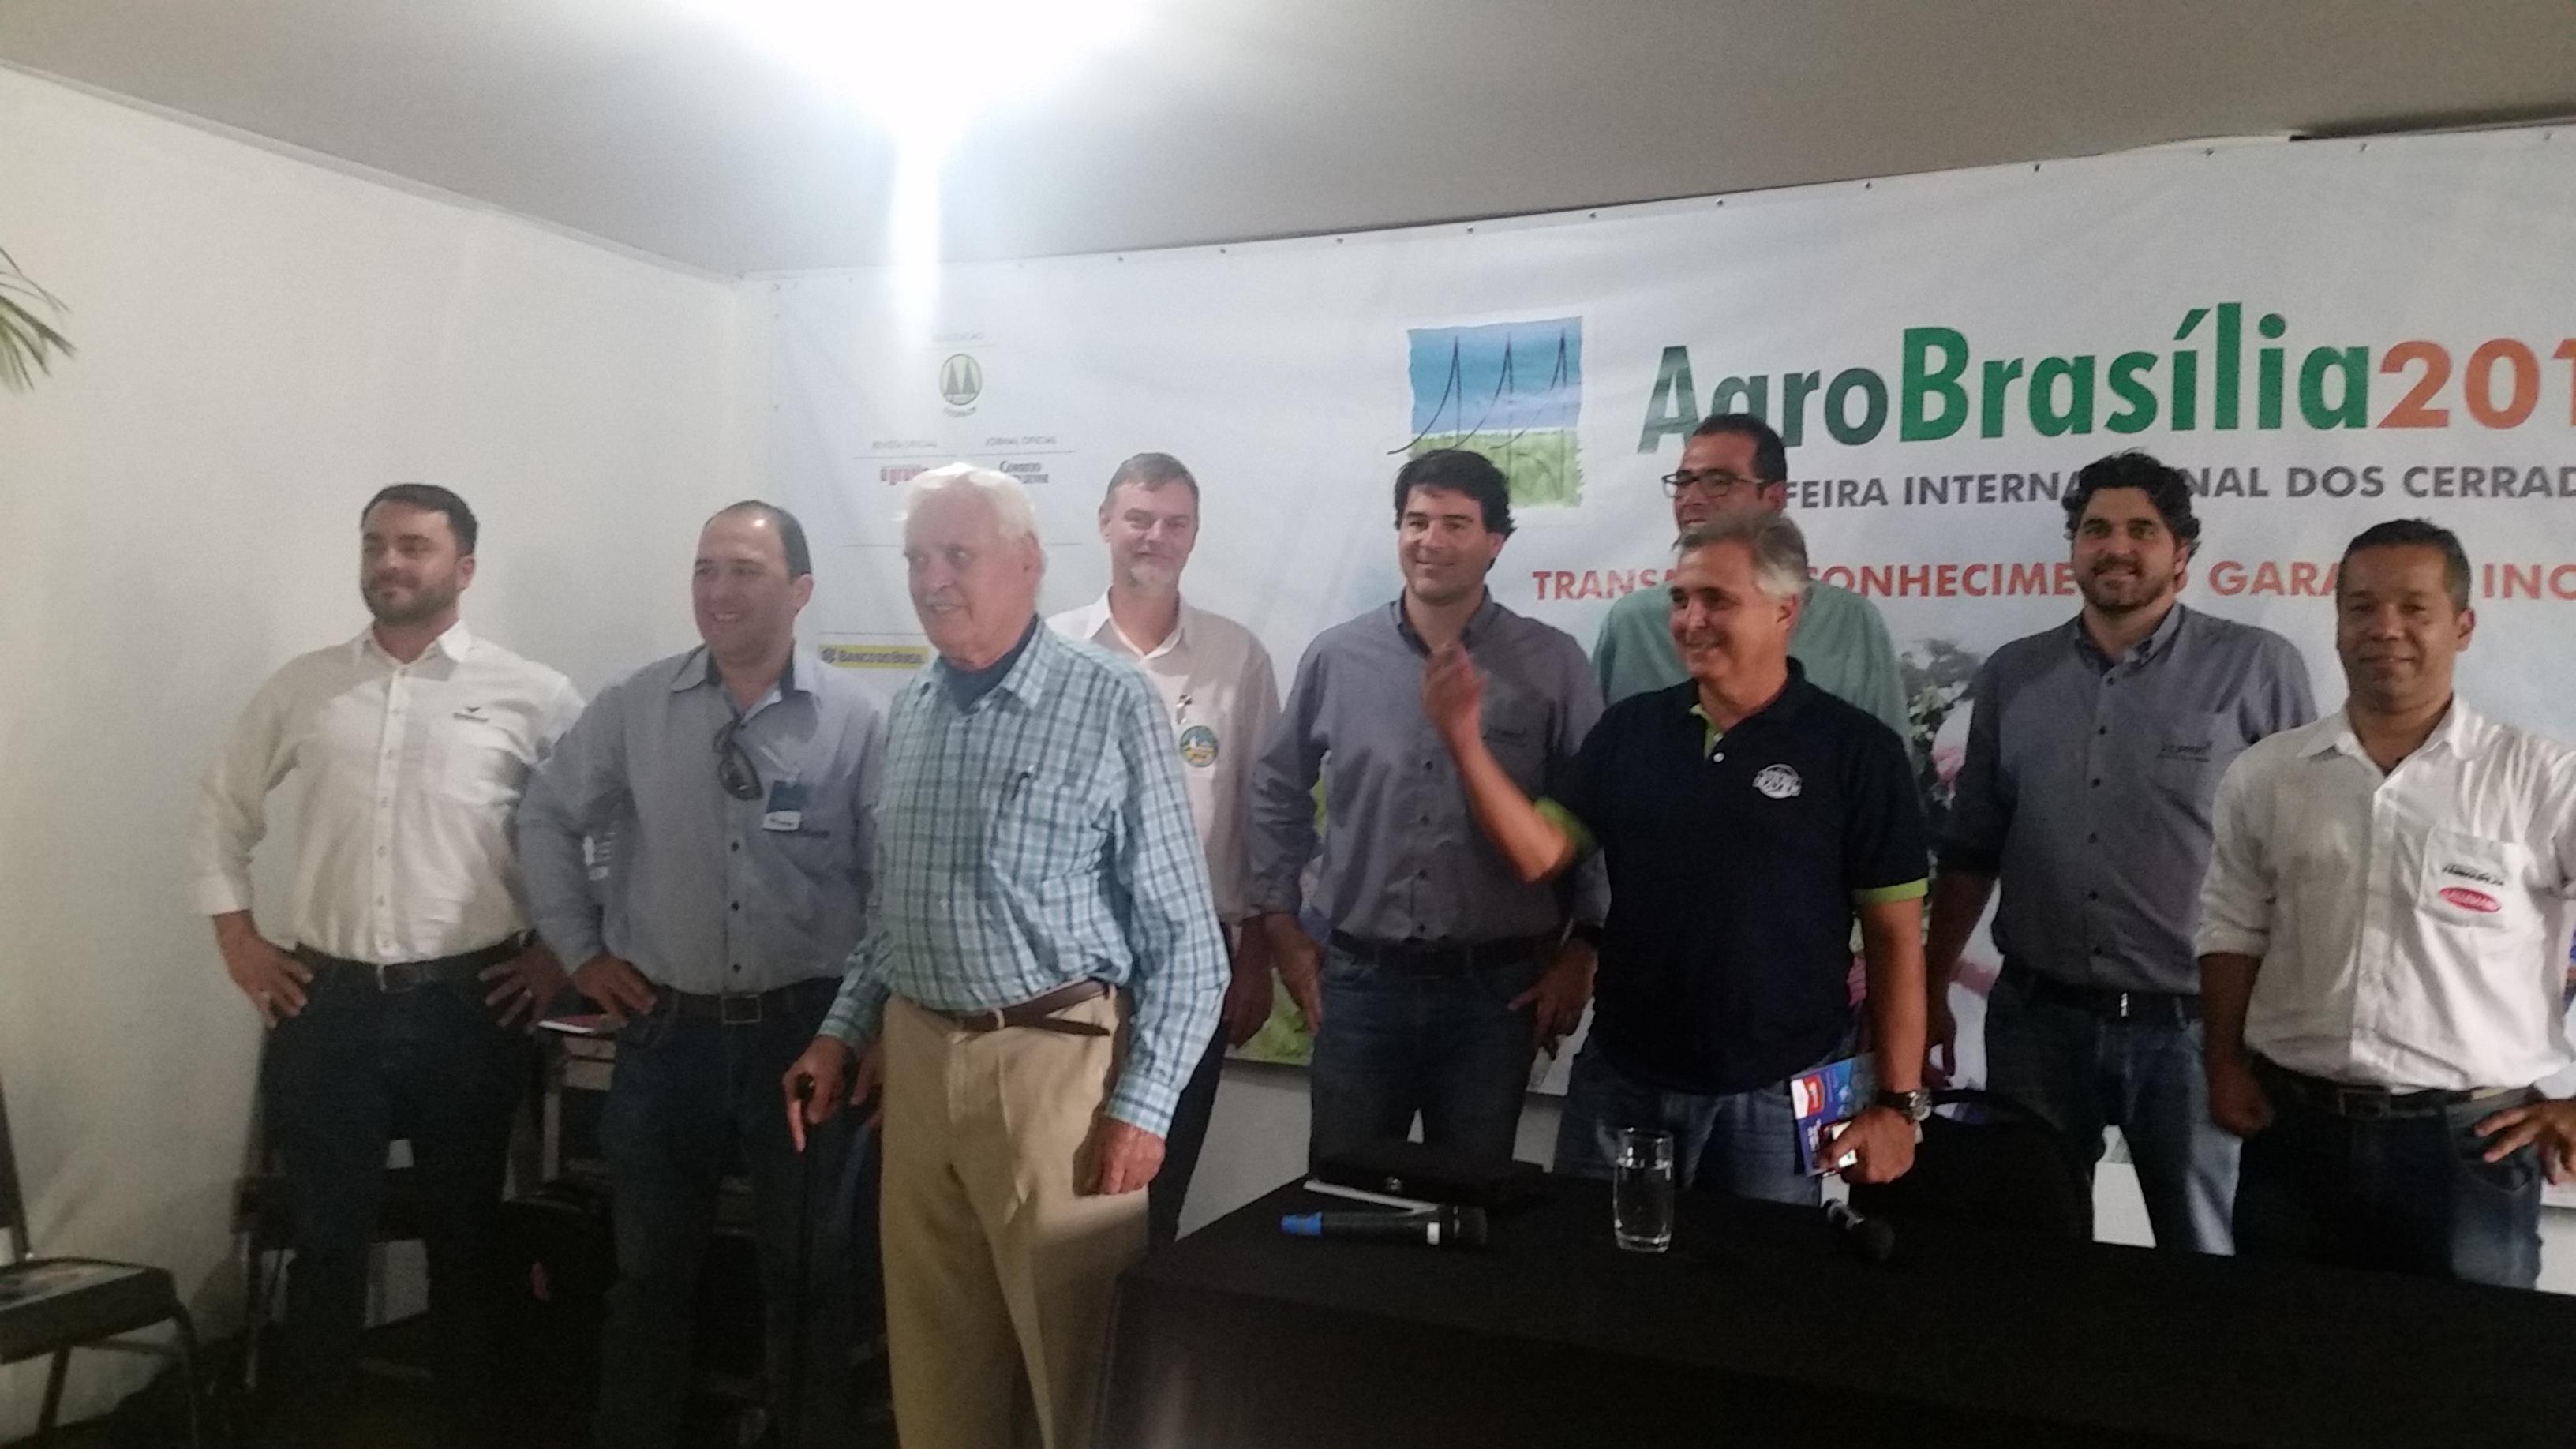 Representantes das empresas, John Landers, Alfonso Sleutjes e Gustavo Herrman